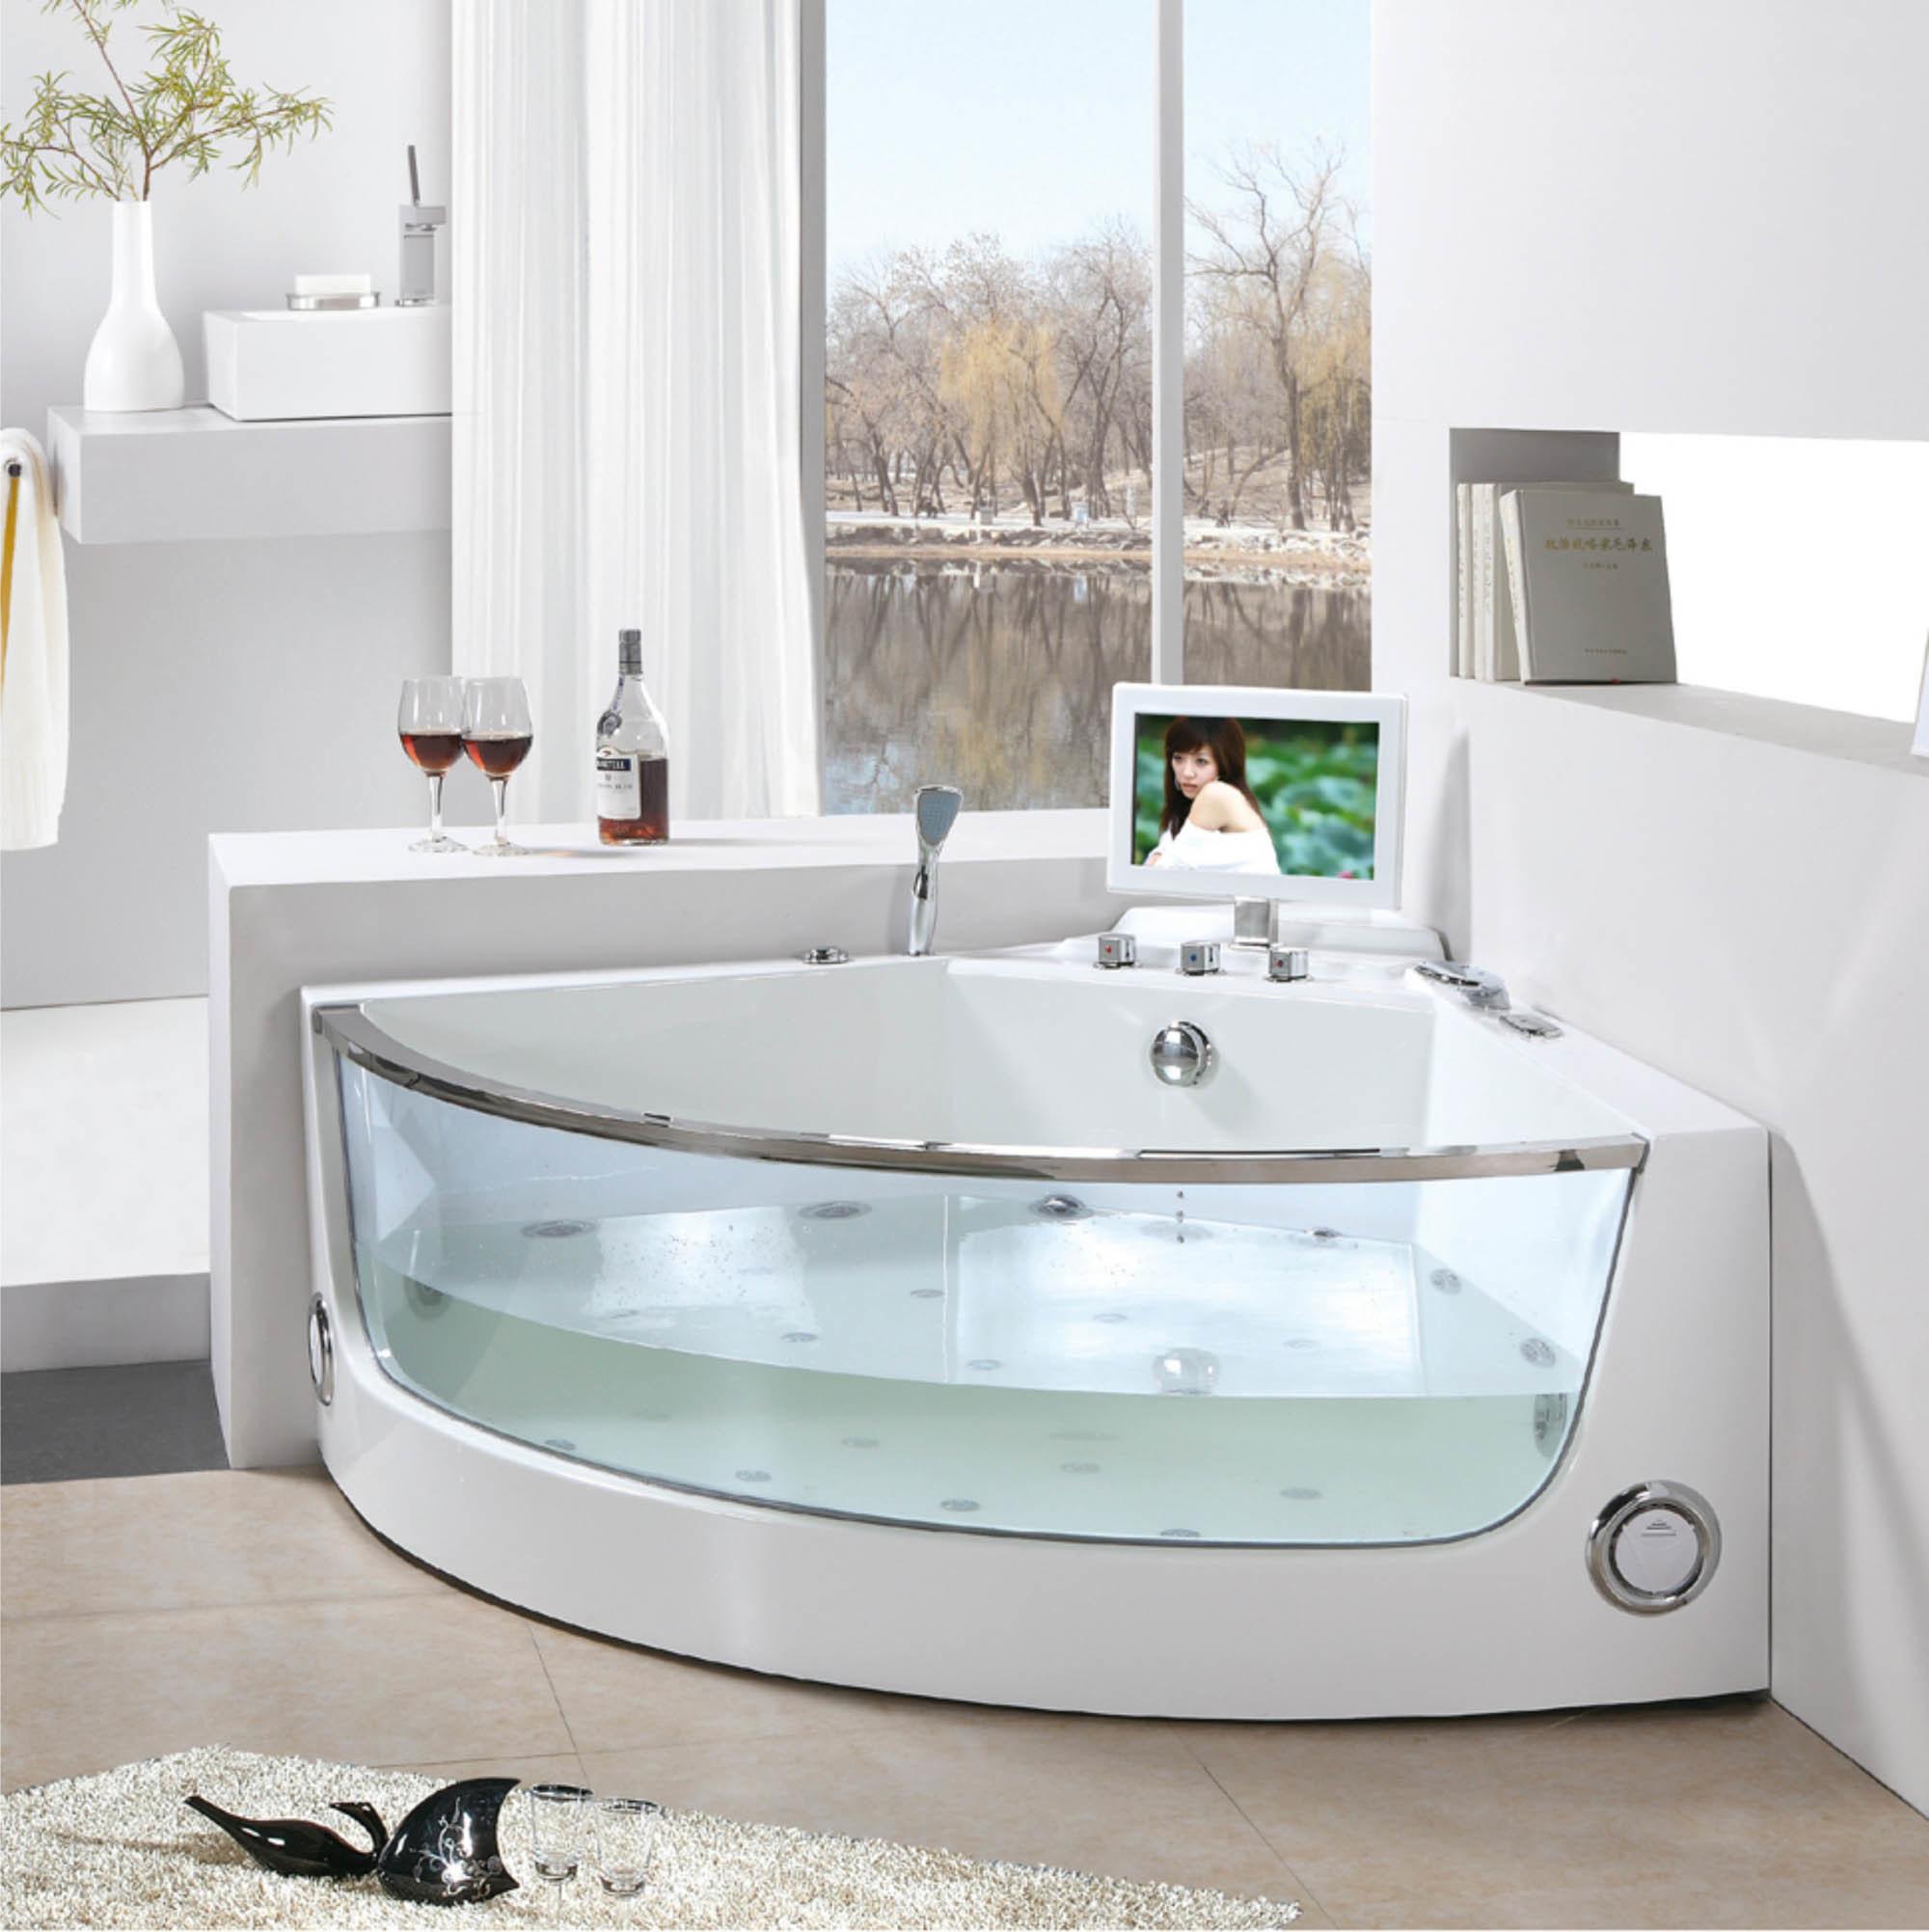 Tinas Para Baño Estilo Antiguo ~ Dikidu.com